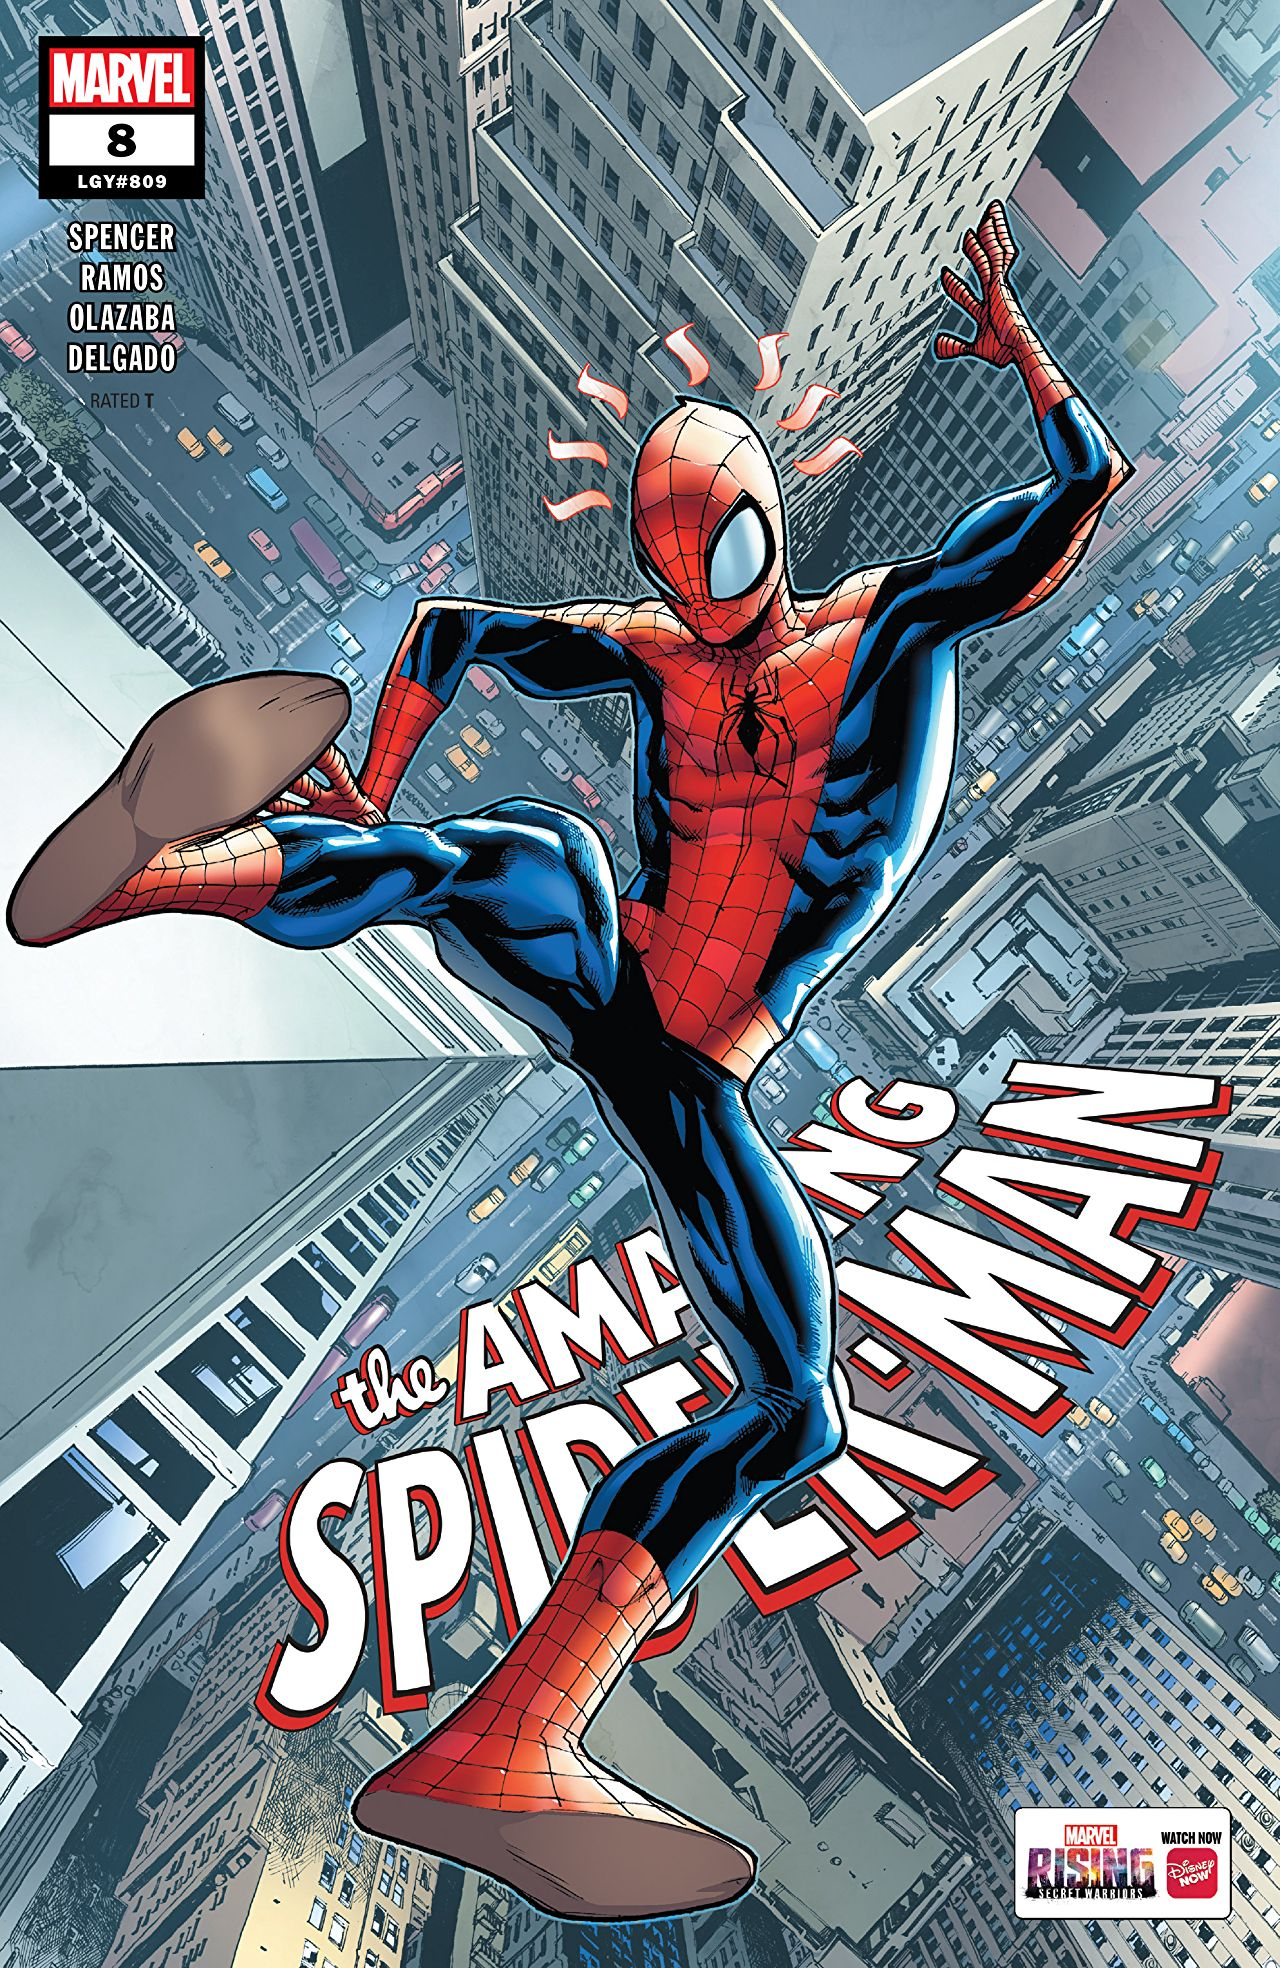 The Amazing Spider-Man 8